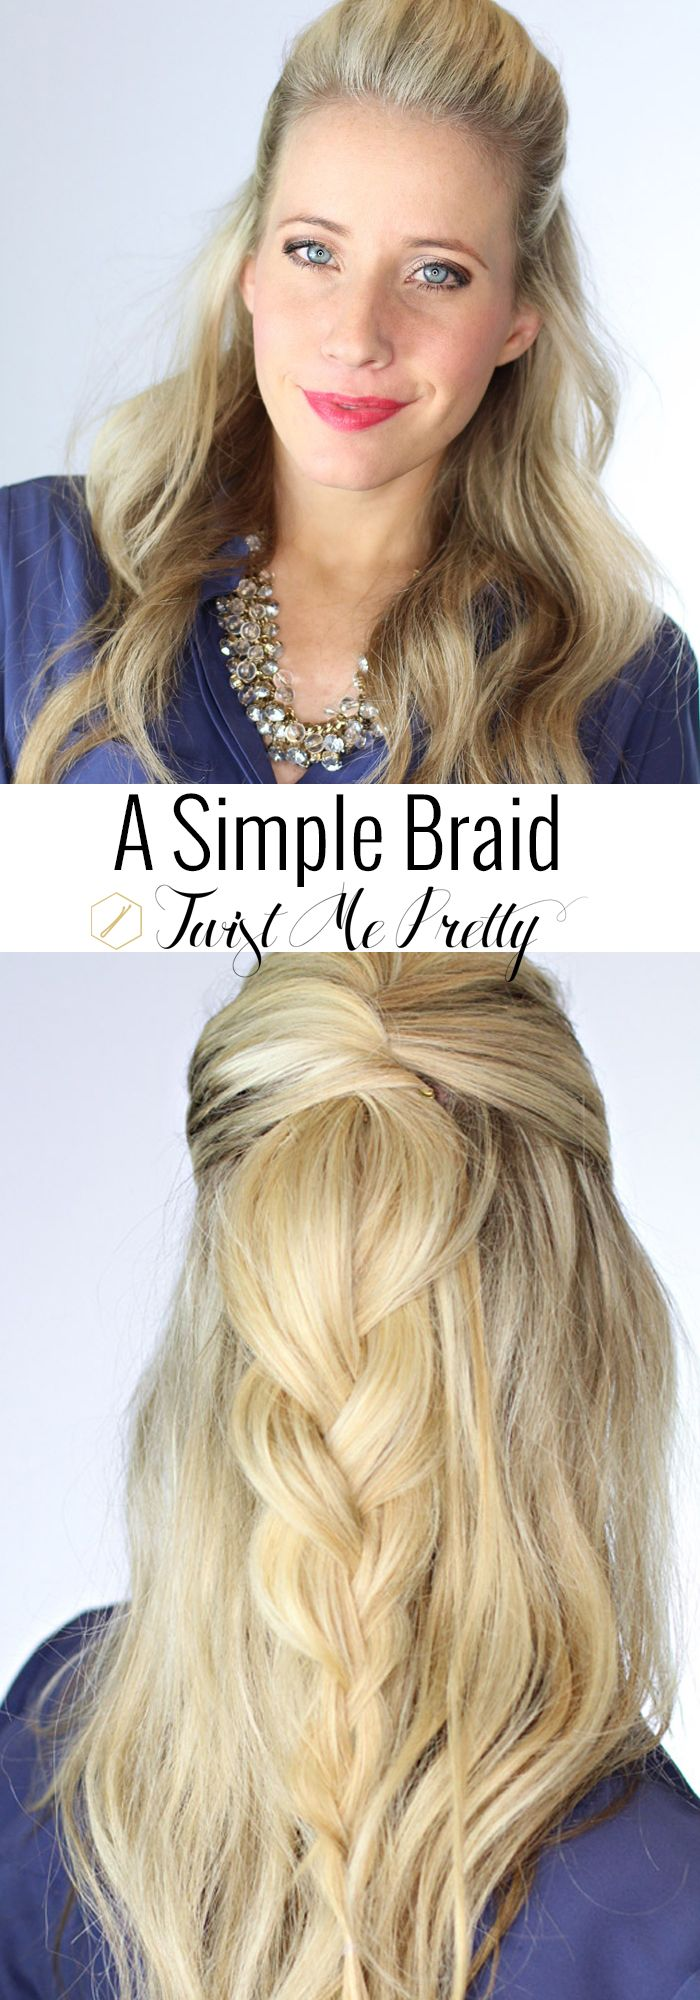 Easy Braid Hair Styles: Hairstyles & Braids